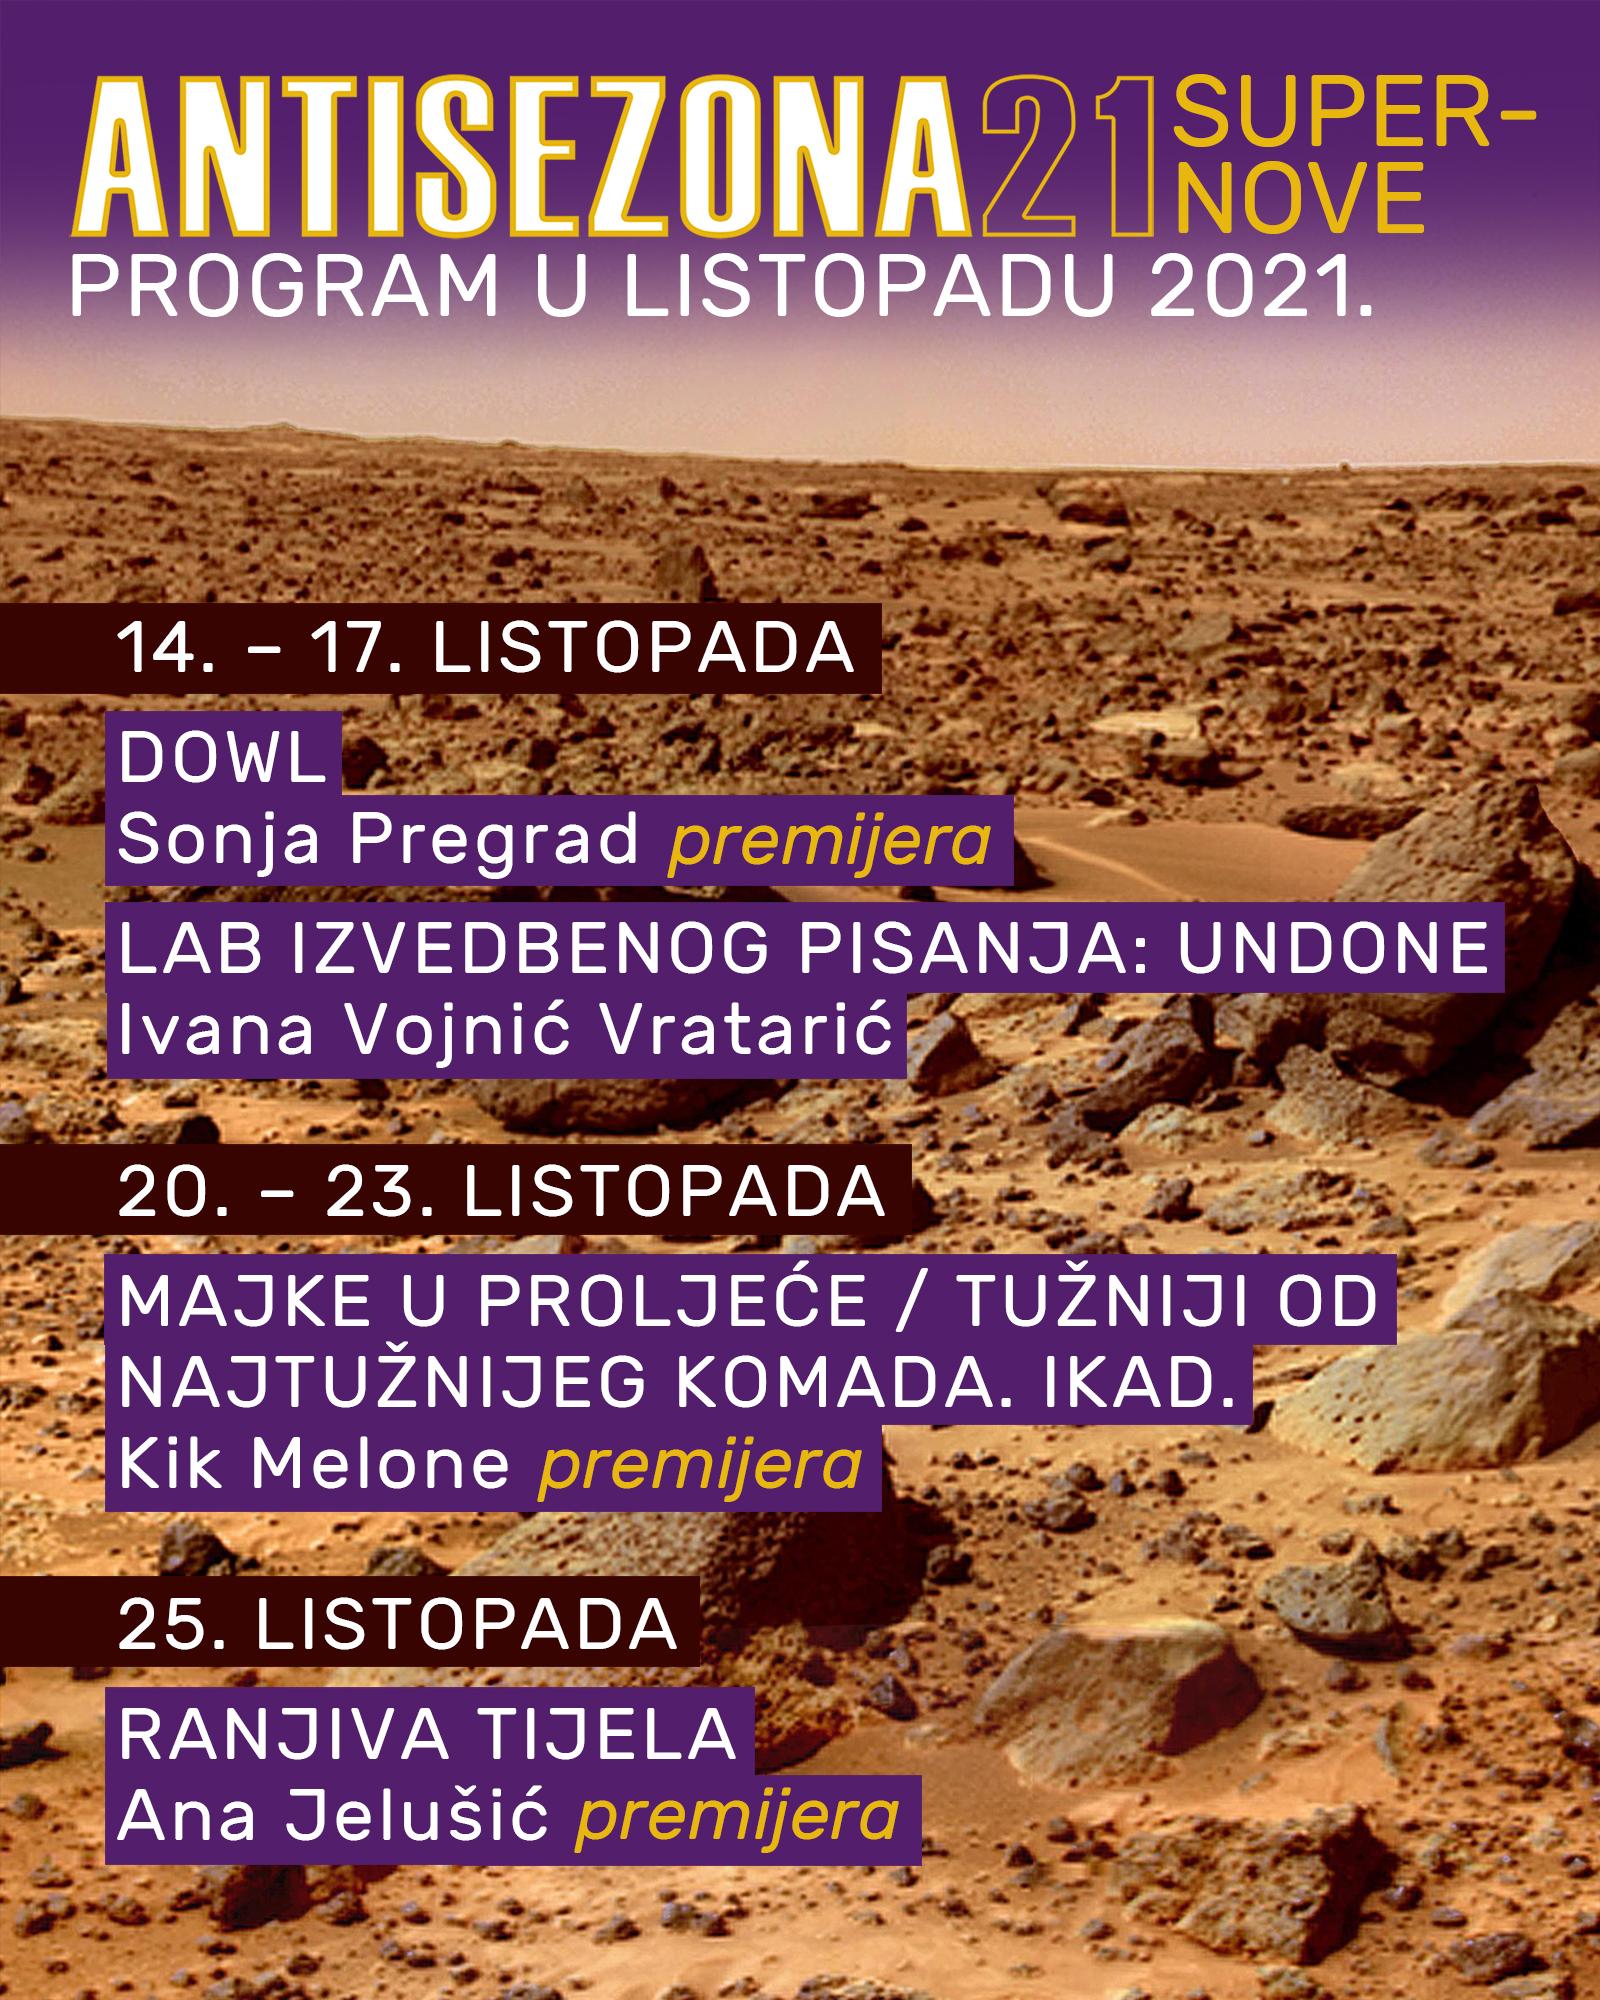 NADOLAZEĆI PROGRAM ZA LISTOPAD 2021.